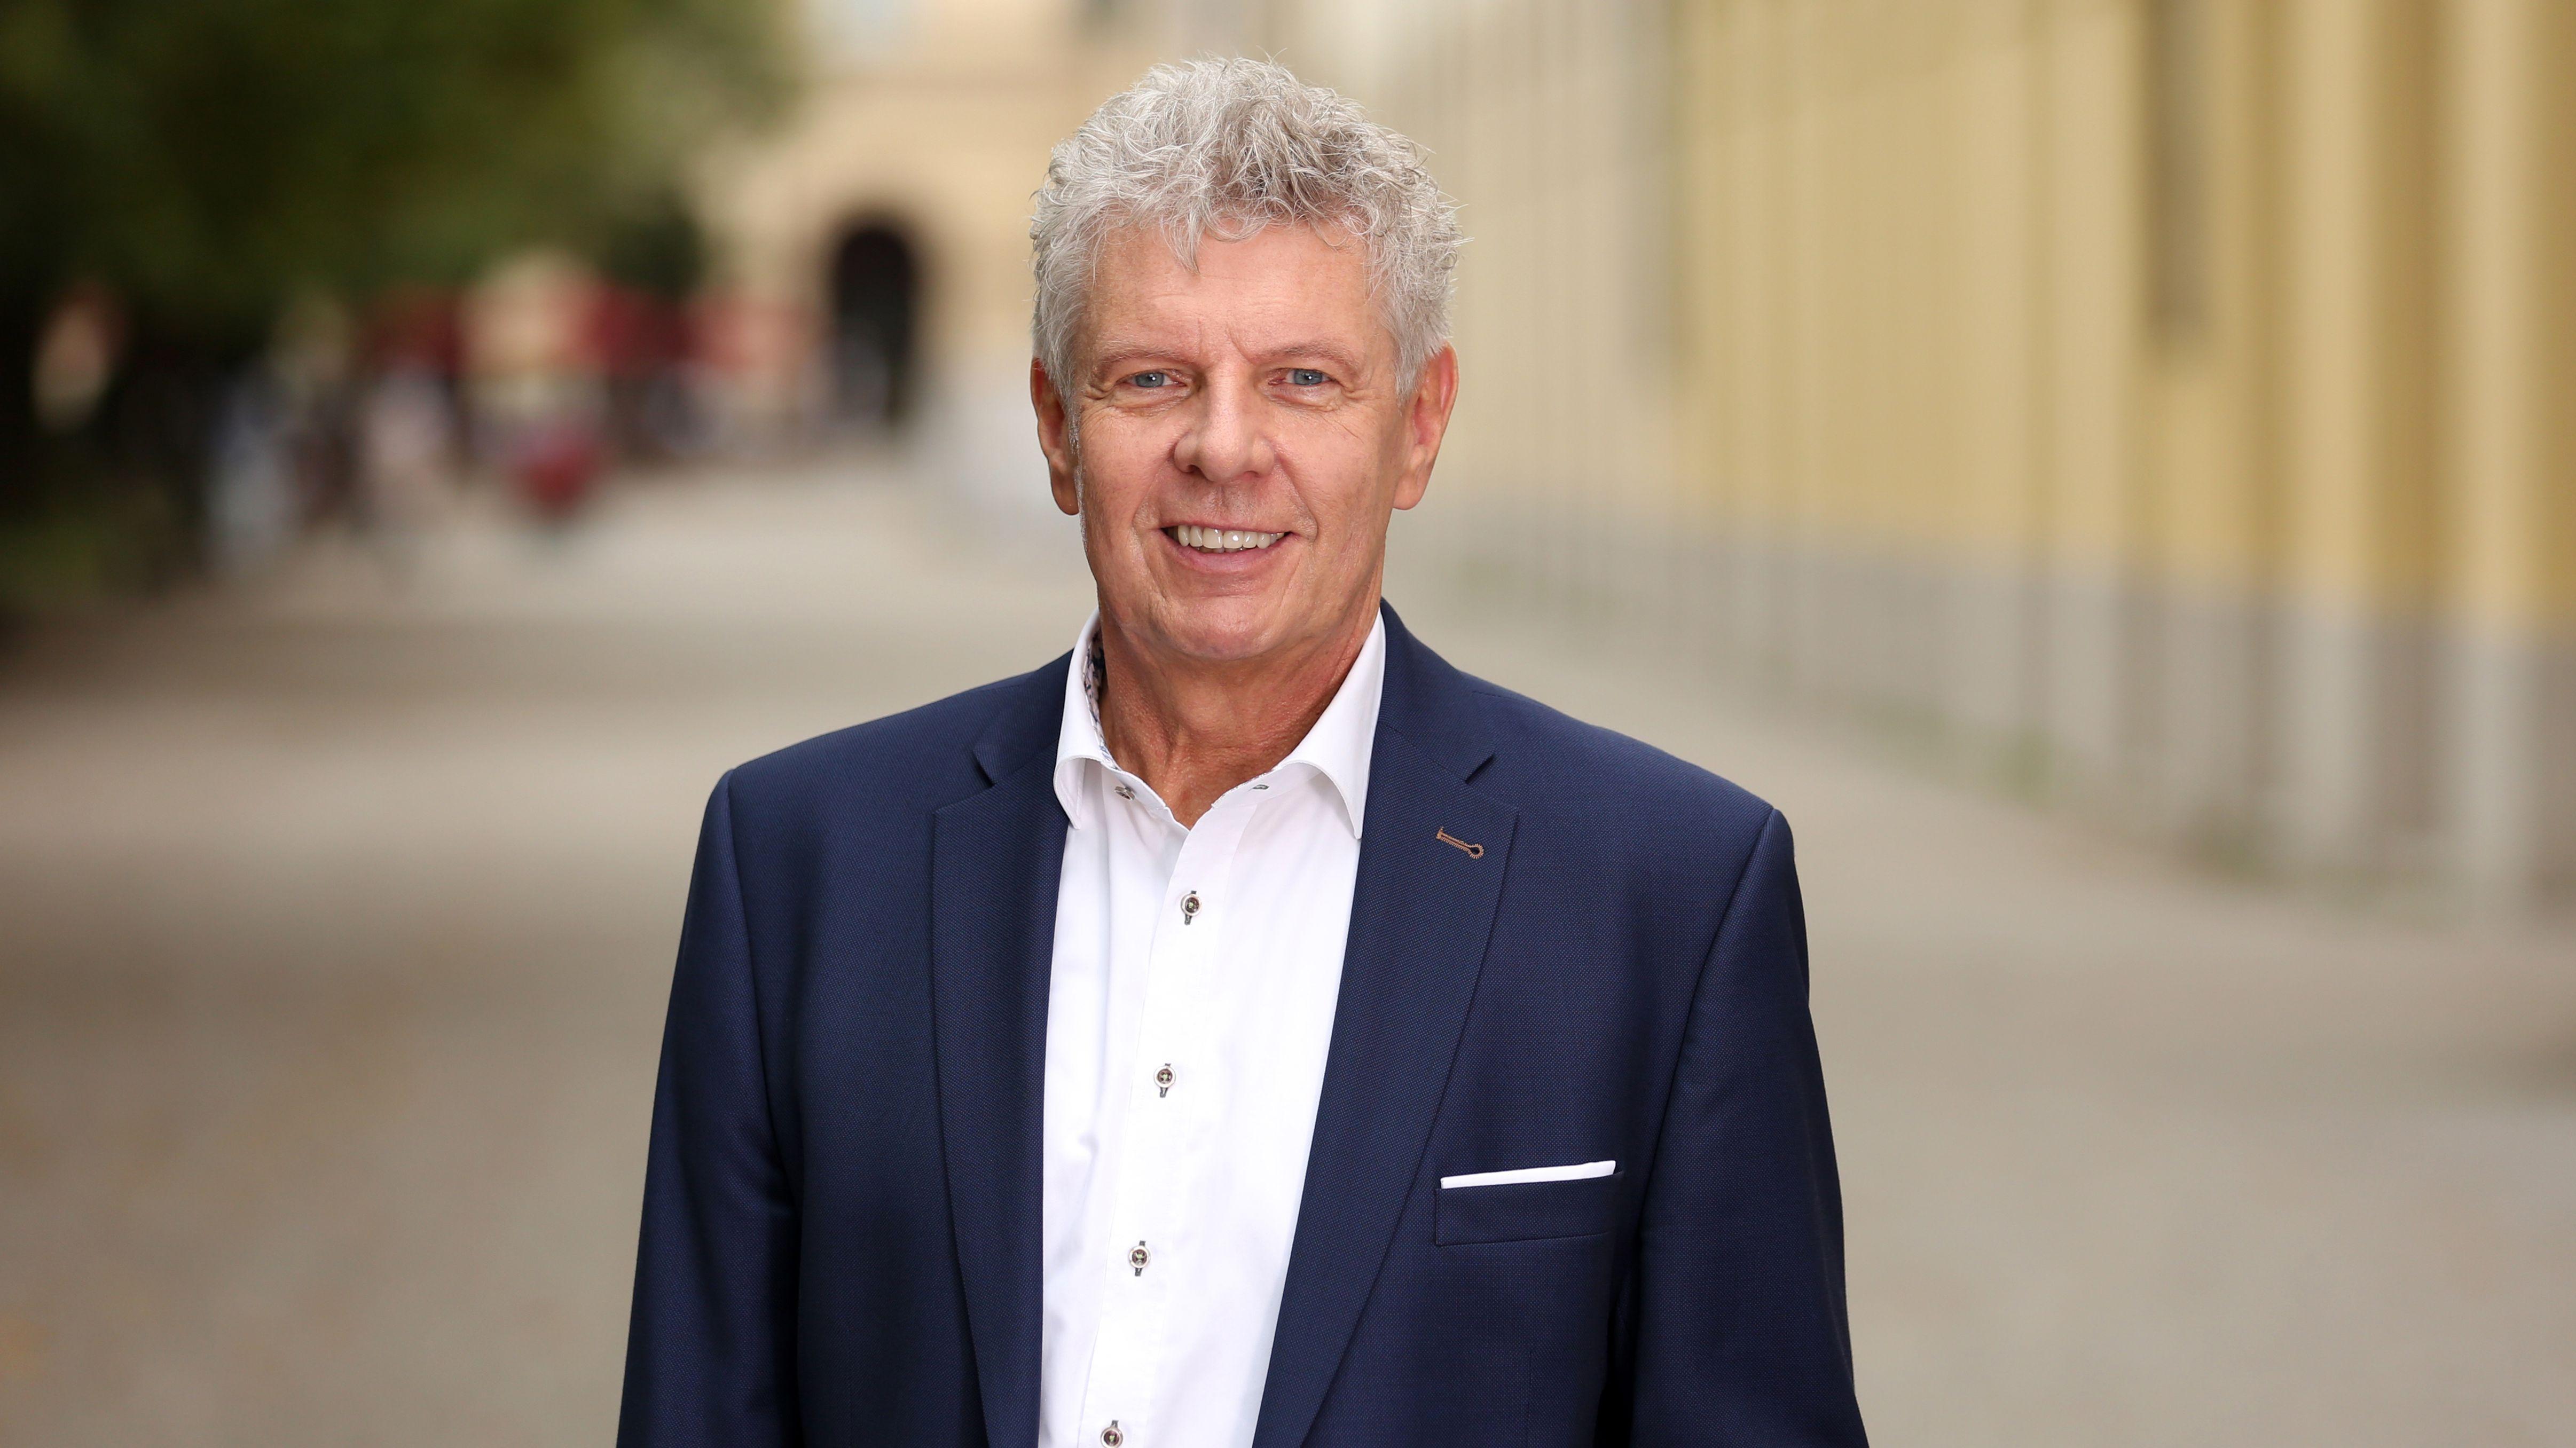 Münchens OB Dieter Reiter